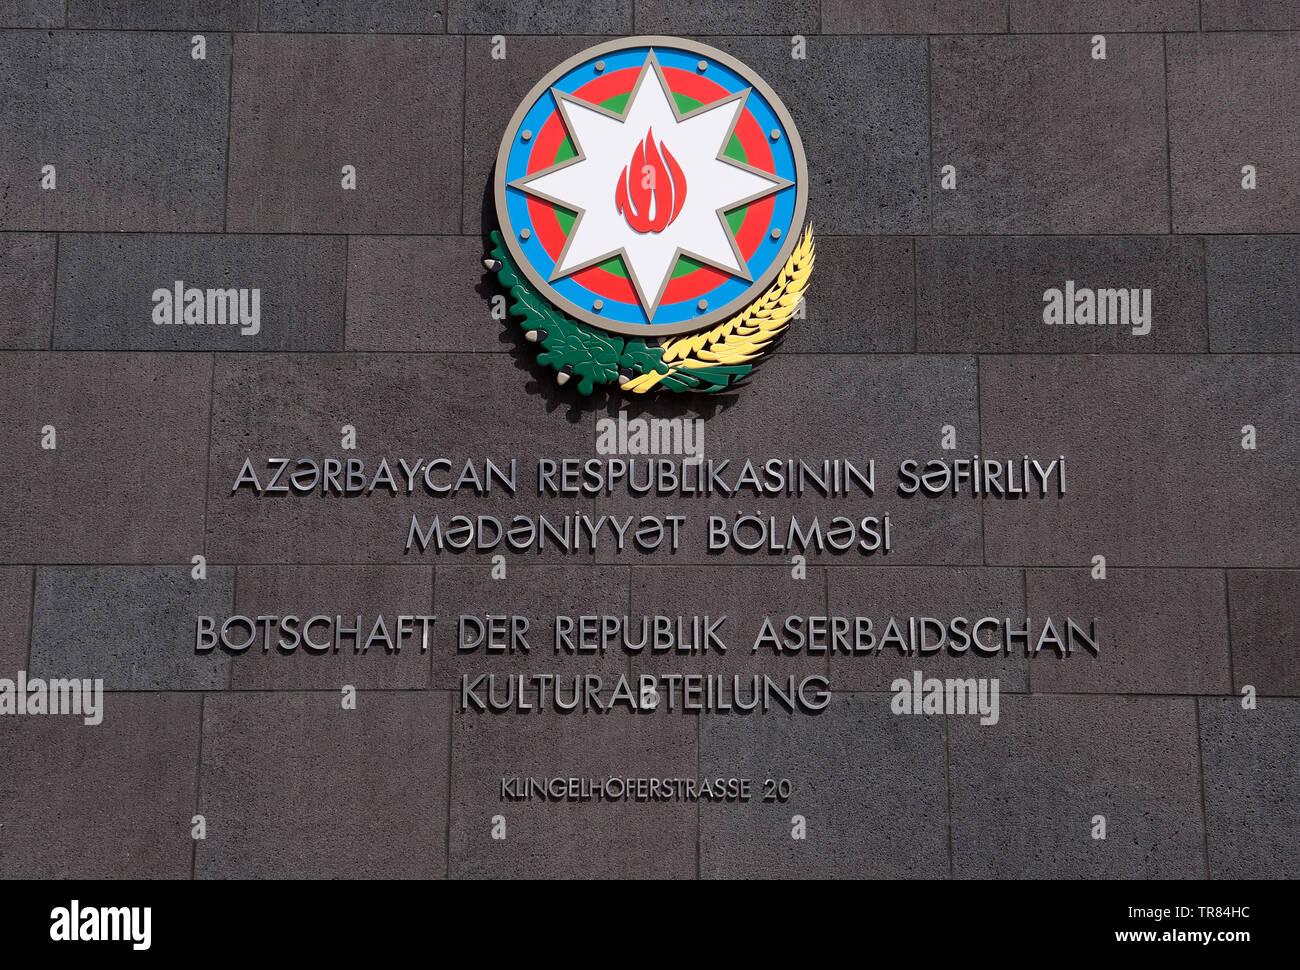 Embassy Republic of Azerbaijan in Berlin, Germany - Stock Image